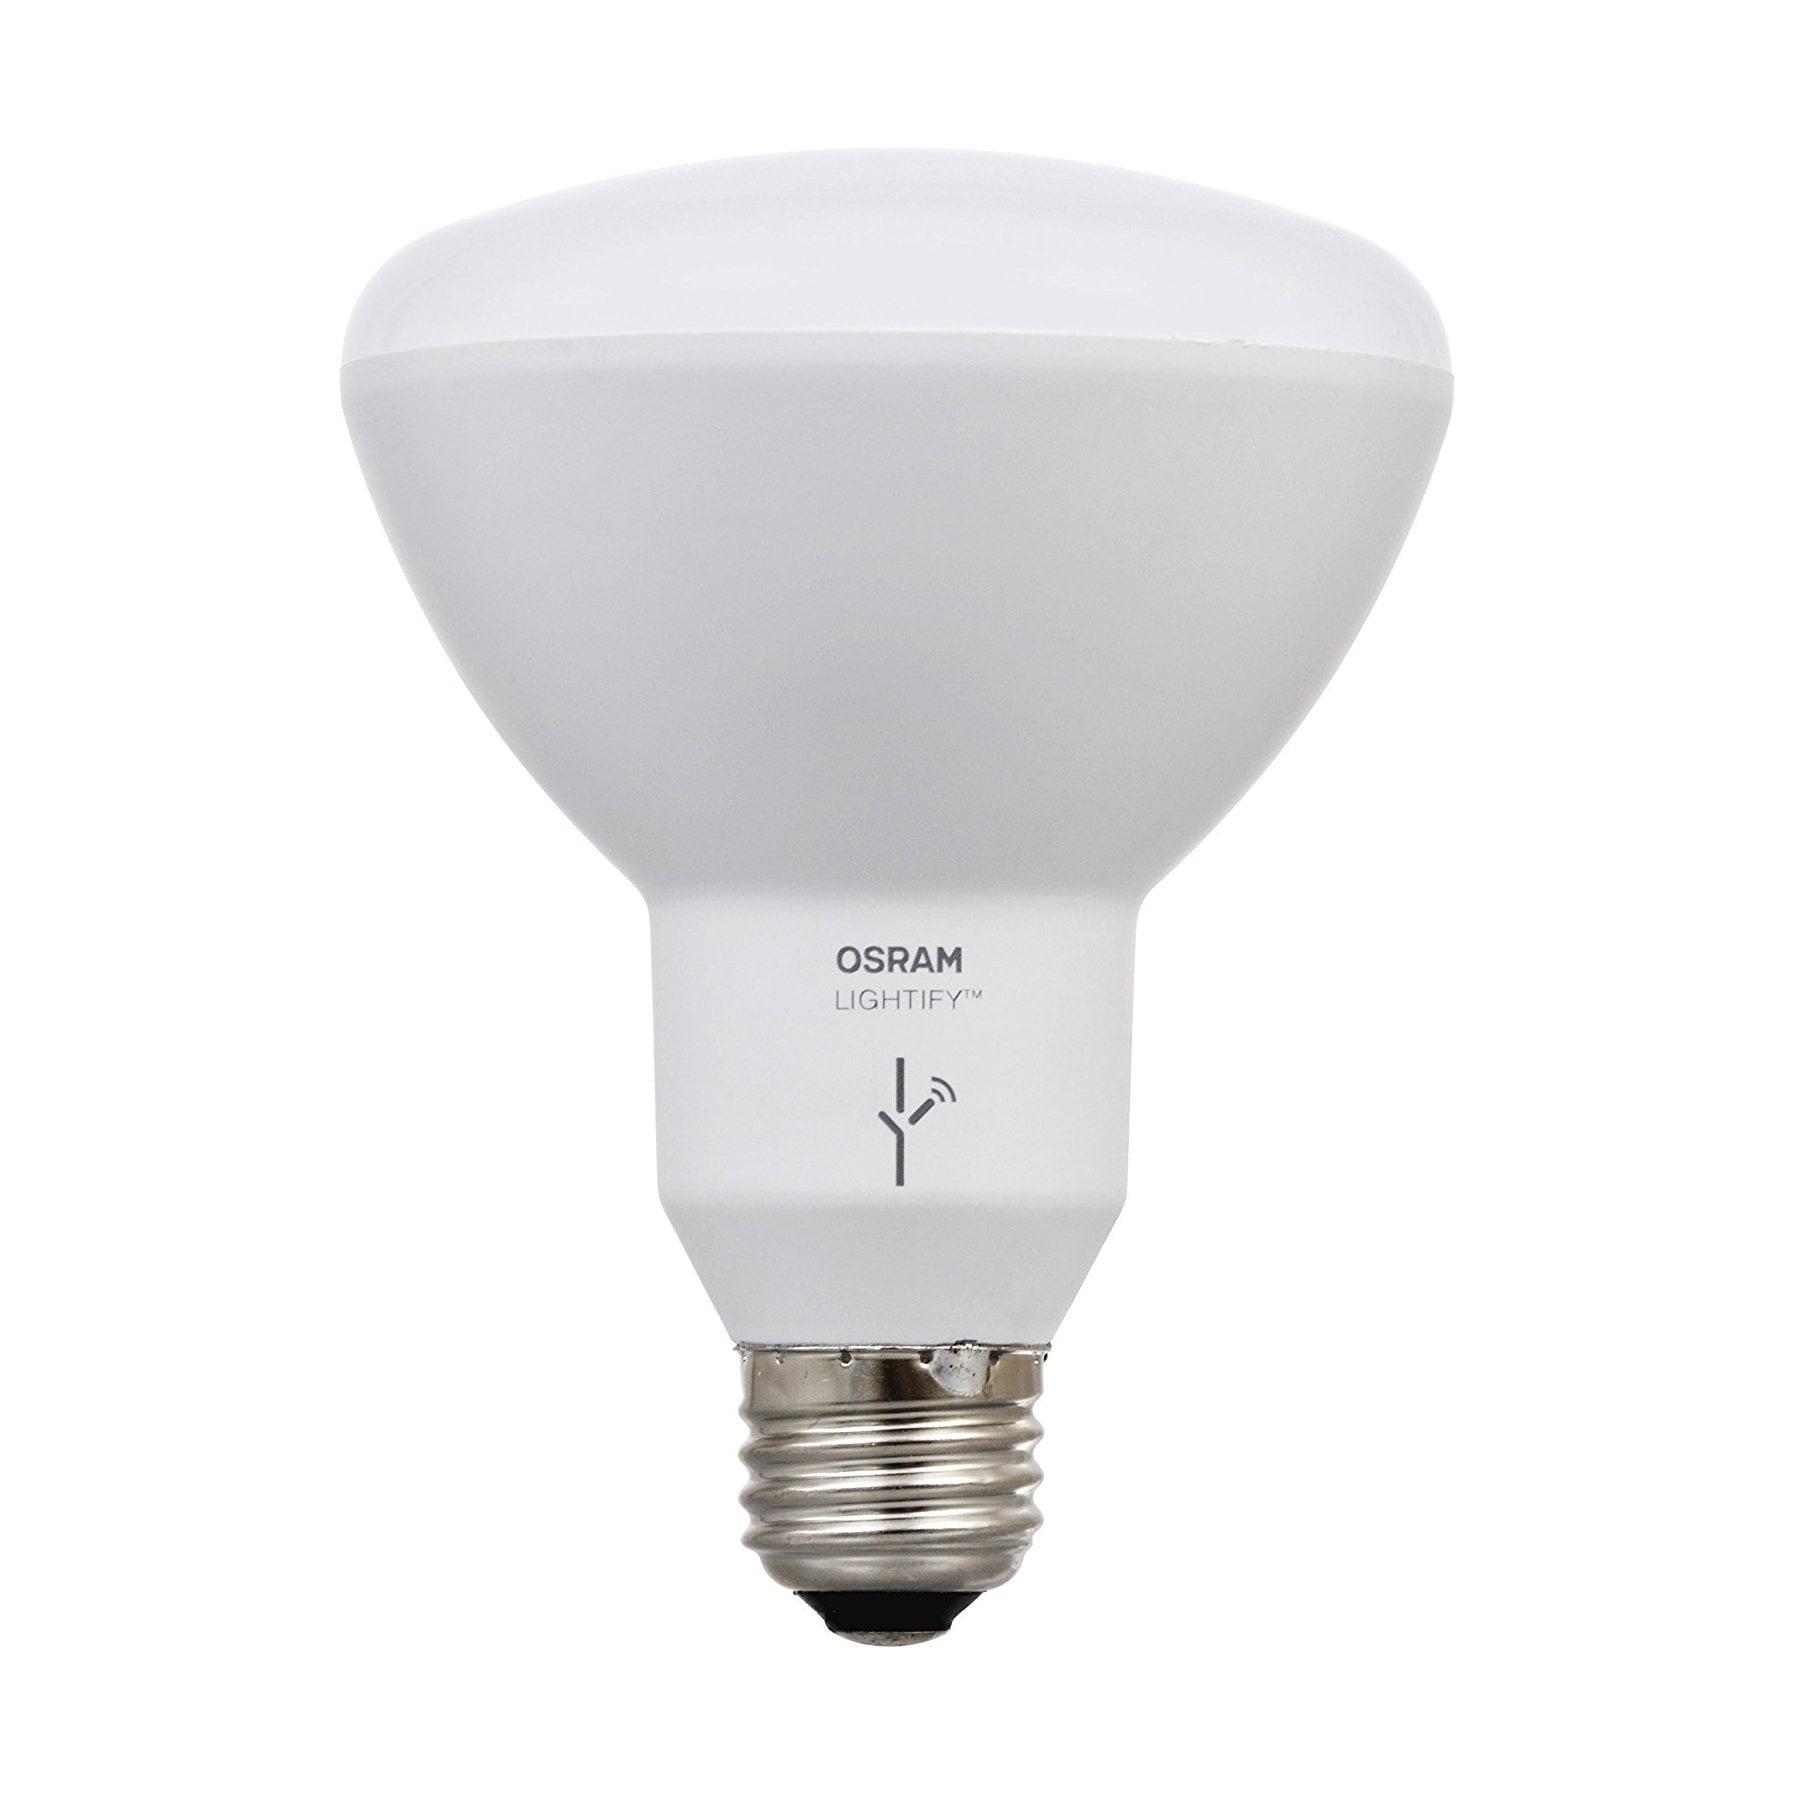 Sylvania Osram Lightify Smart Home 65W BR30 White/ Color LED Light Bulb (6 Pack) - image 4 of 9